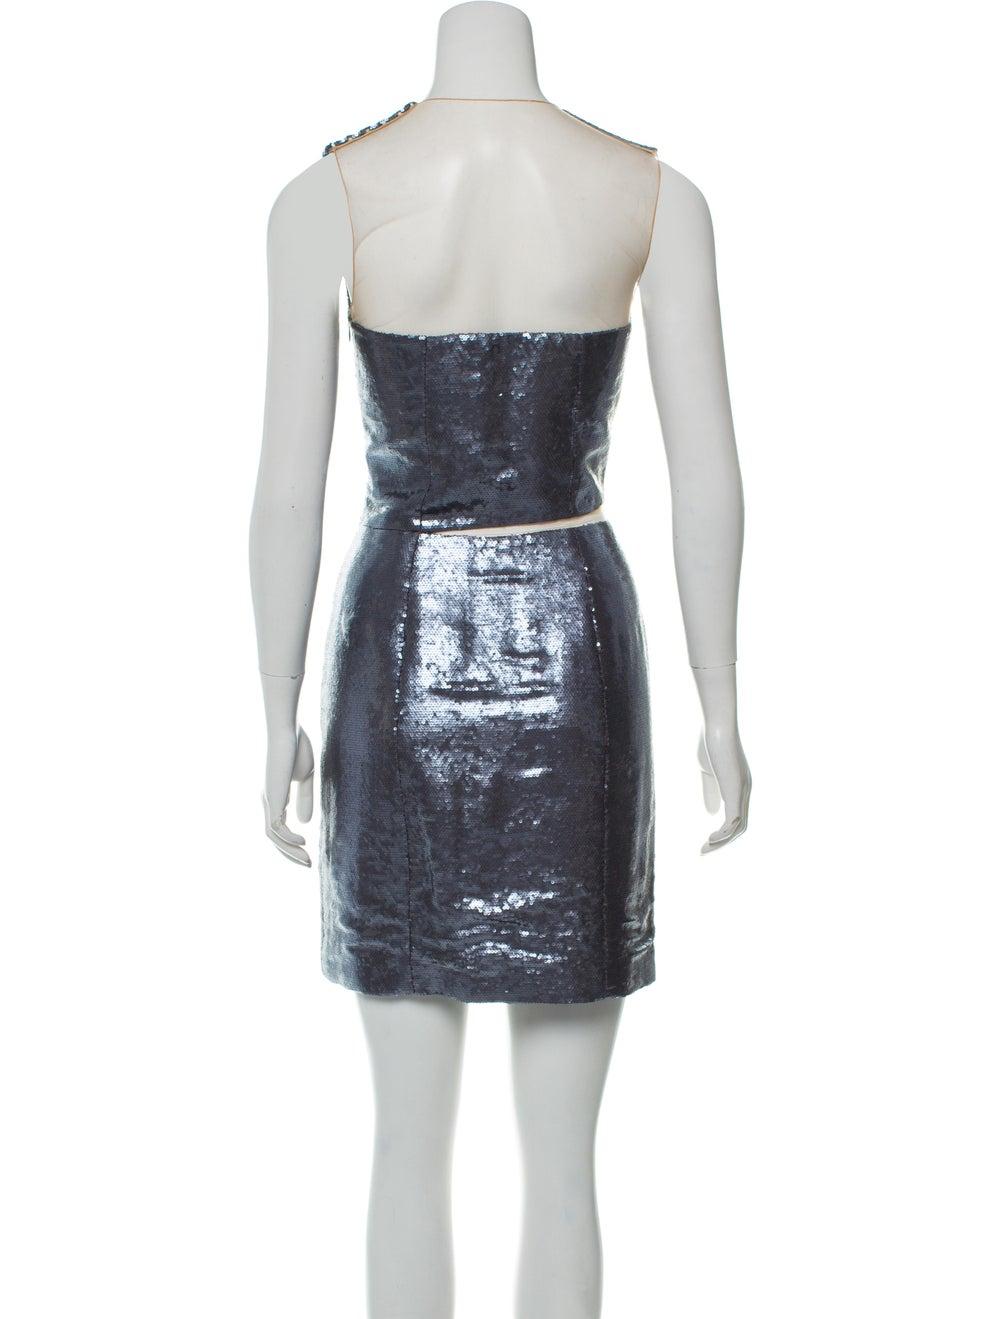 Kaufmanfranco Mesh-Trimmed Sequin Dress - image 3